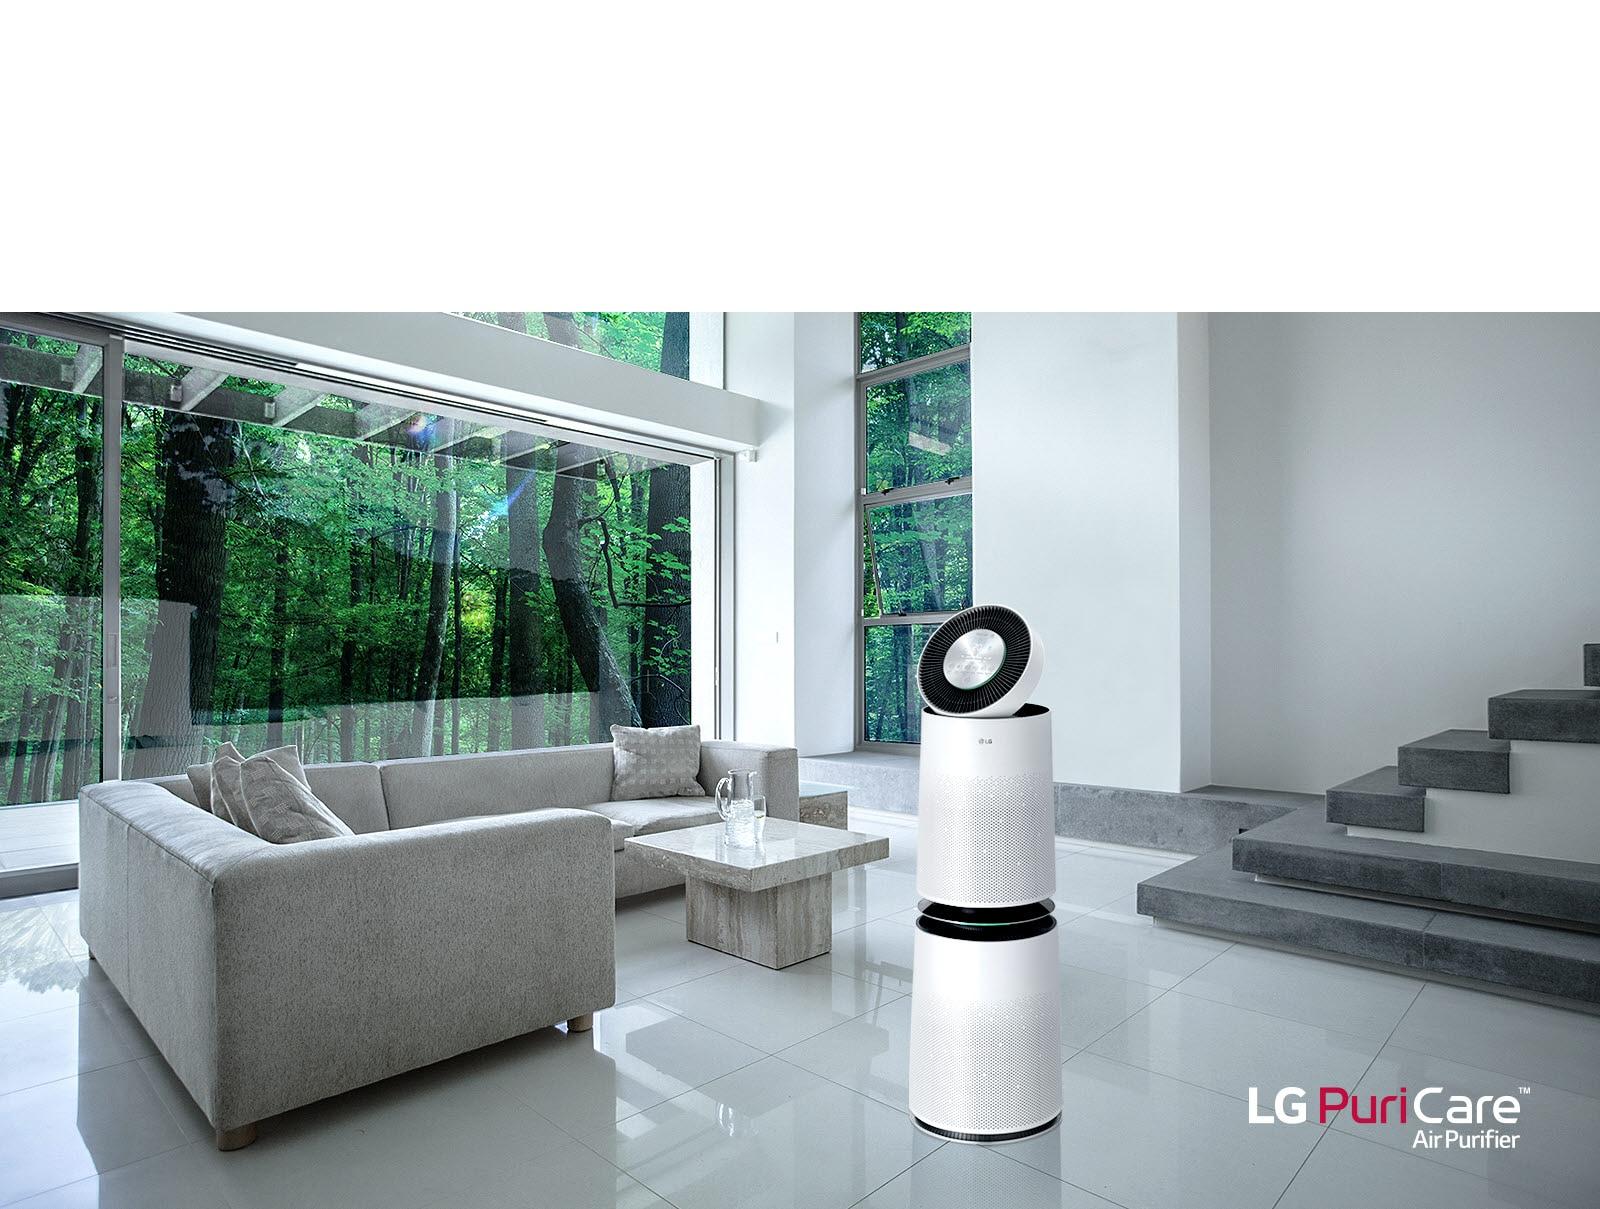 LG PuriCare™1